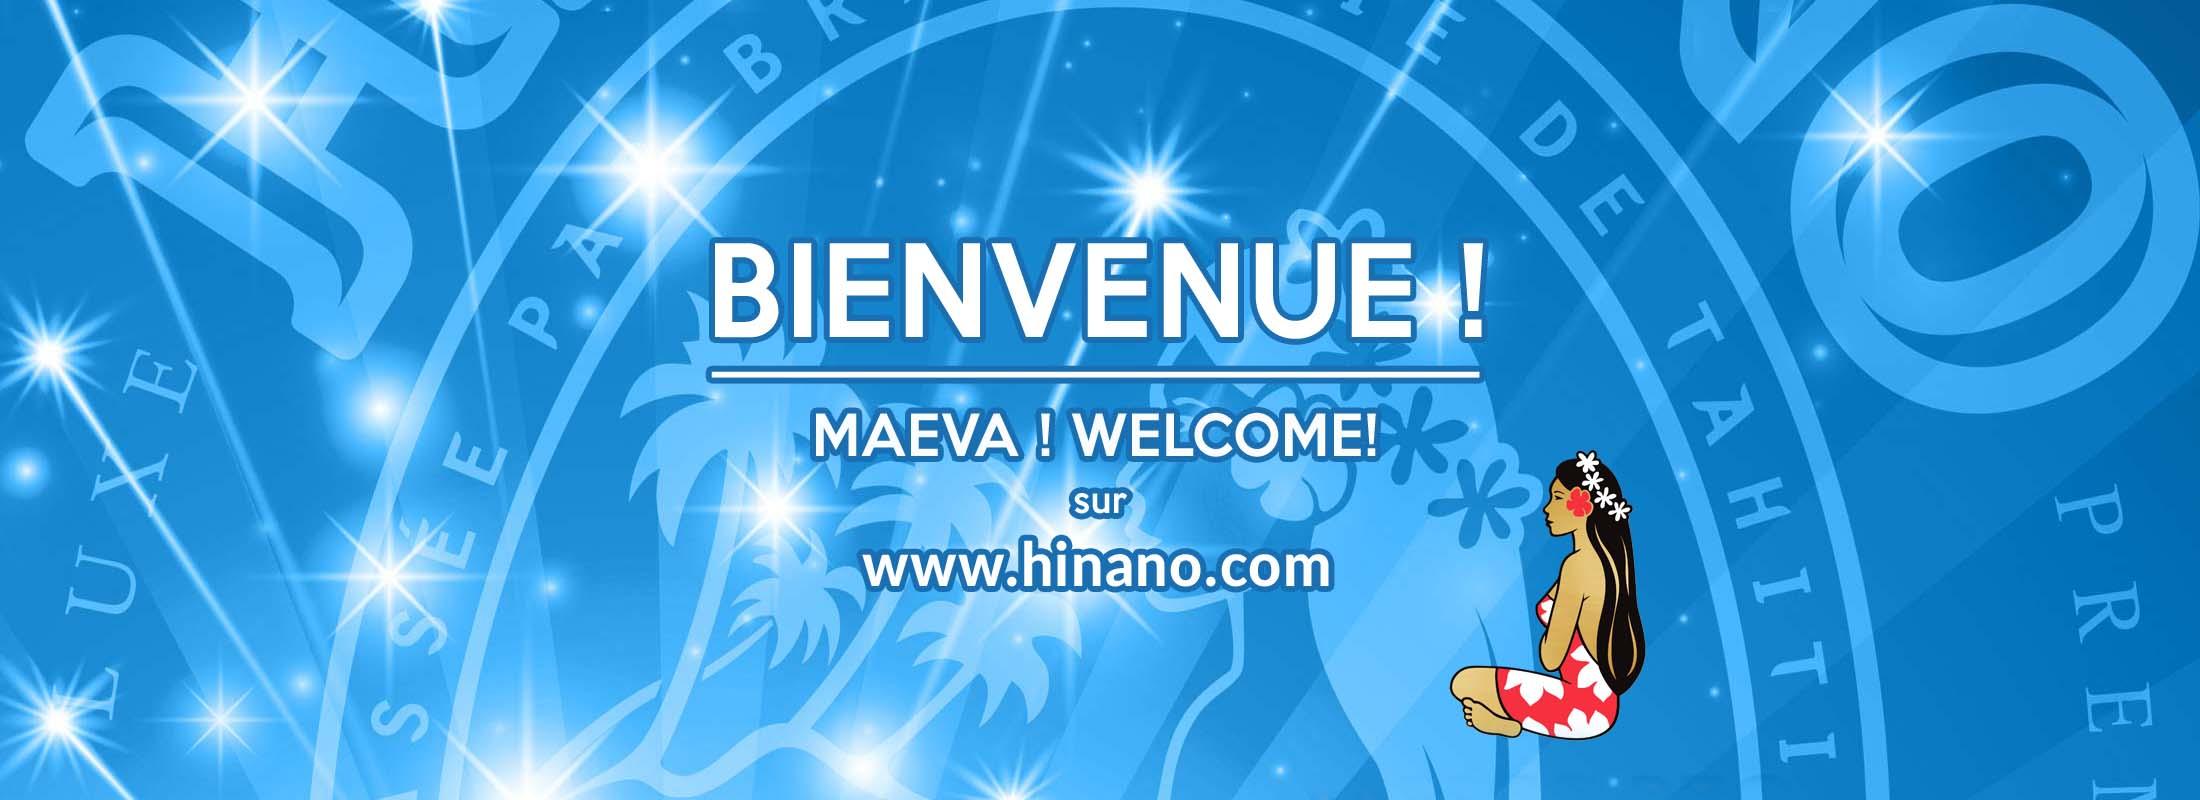 bienvenue2018-FR